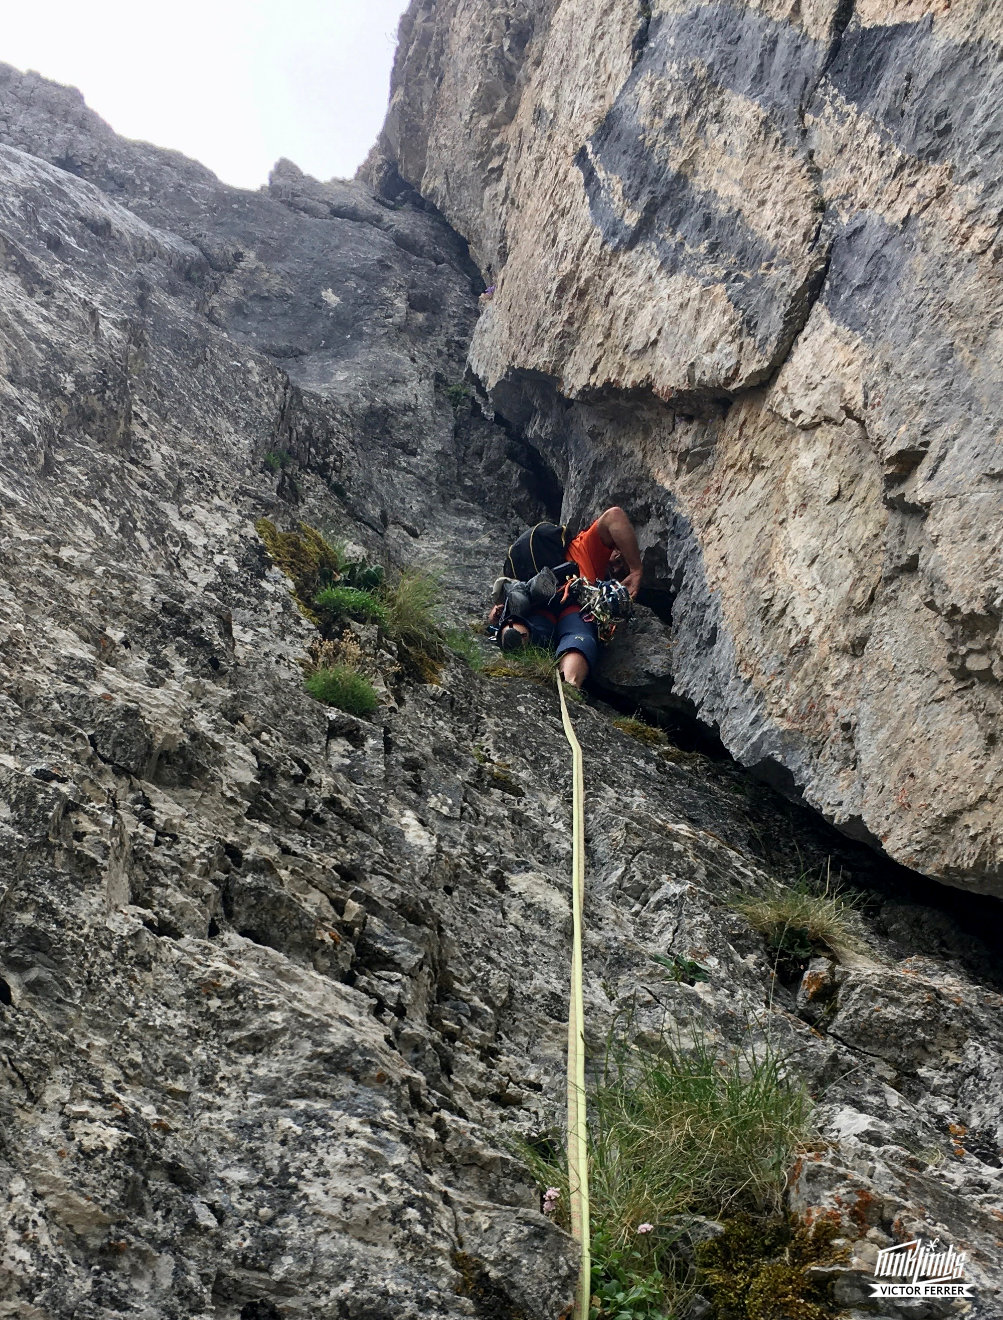 cadí, nord, Joan Cerdà, Heinz Pokorsky, cerdanya, estana, prat cadí, escalada, via llarga, ressenya, rock climbing, catalunya, climb, climbing, arrampicata, pirineus